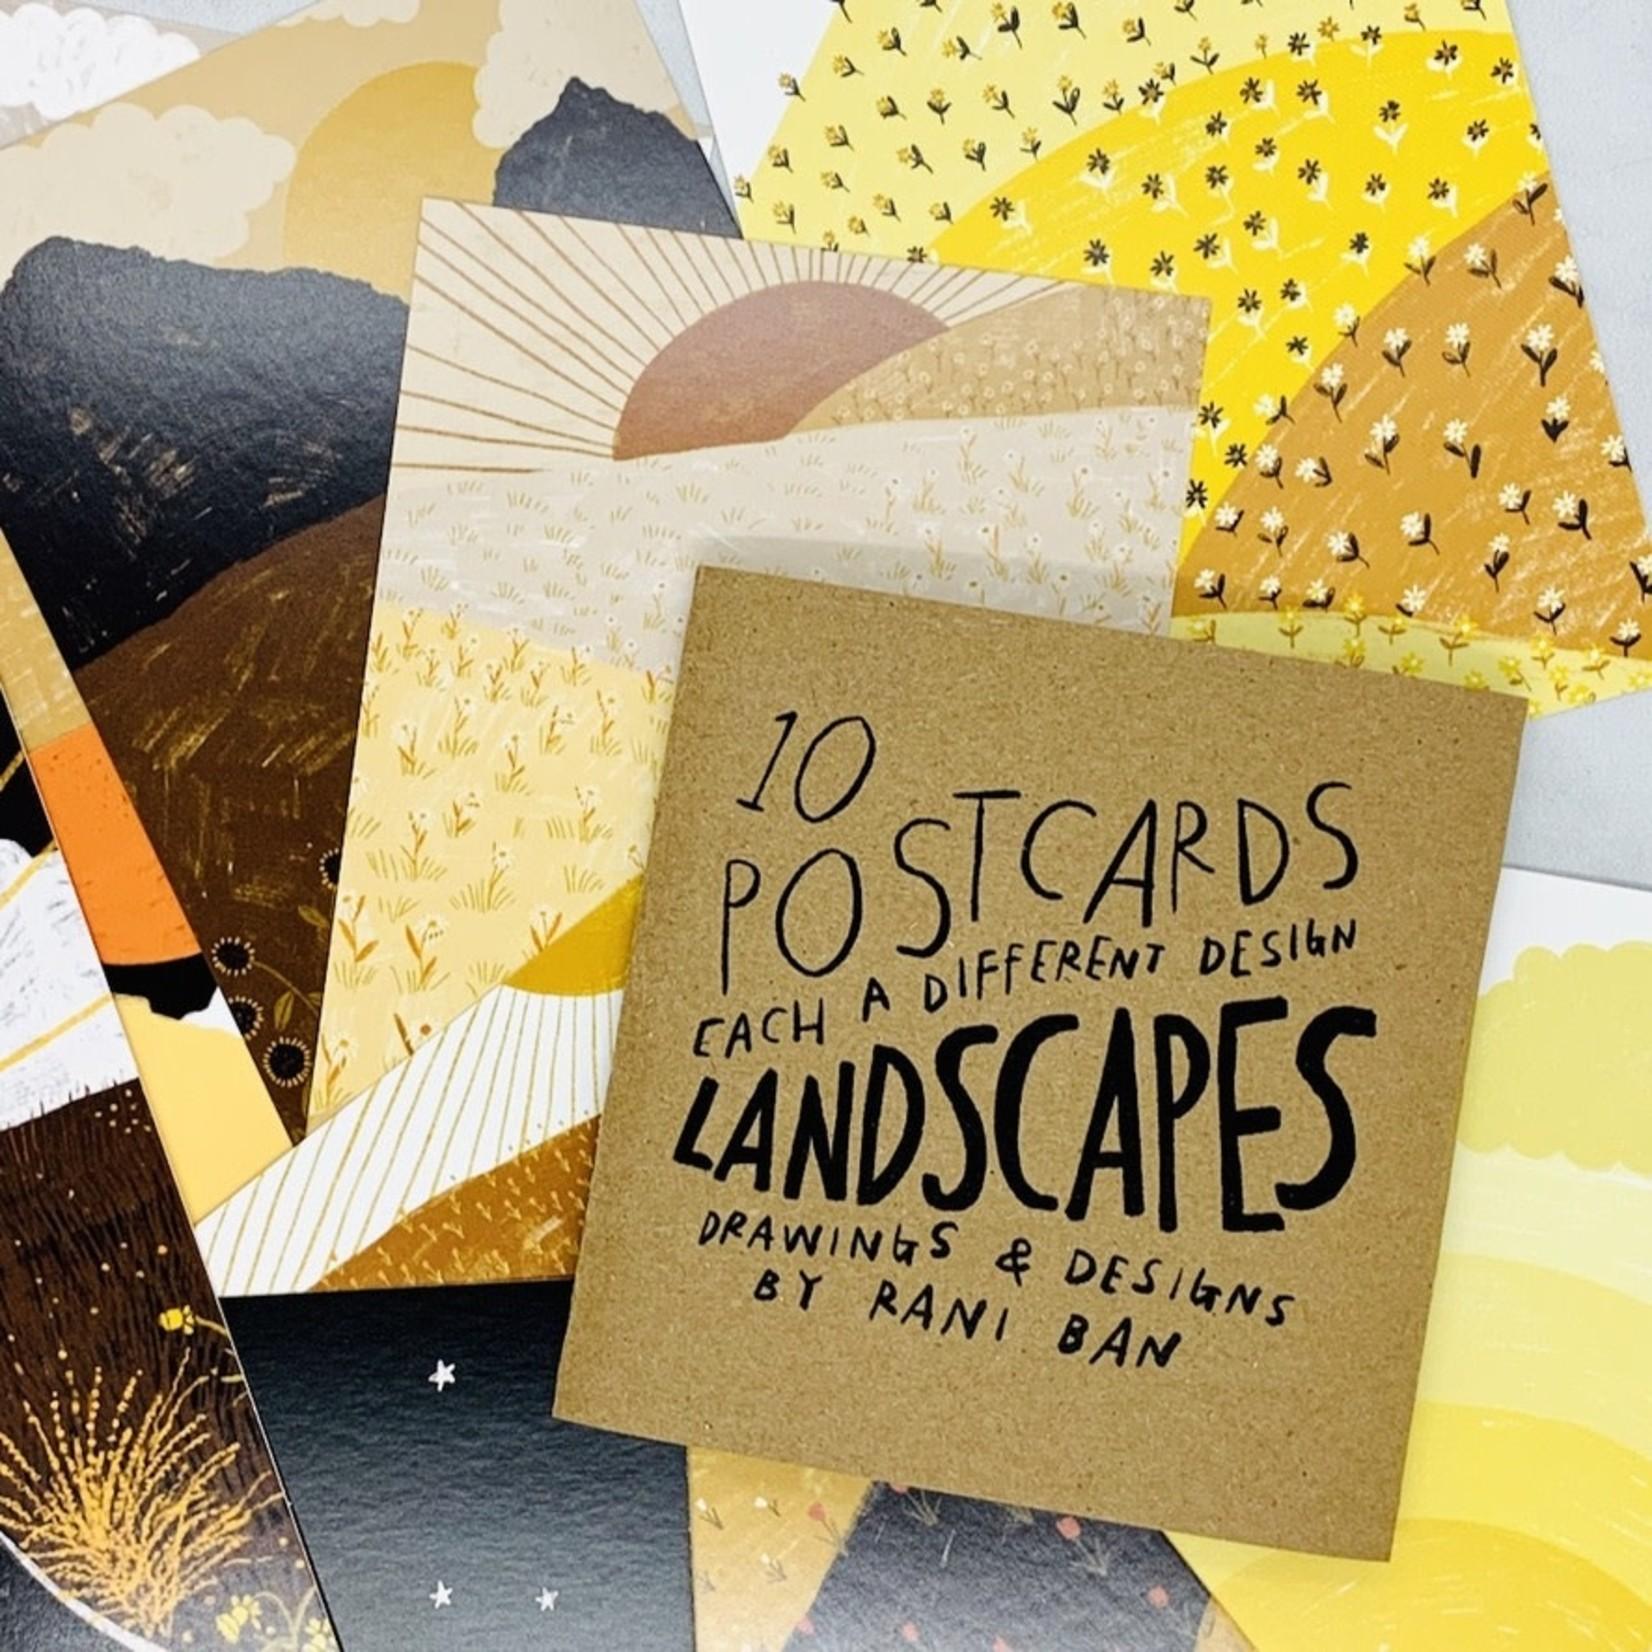 Rani Ban Co 16 Postcard Packs